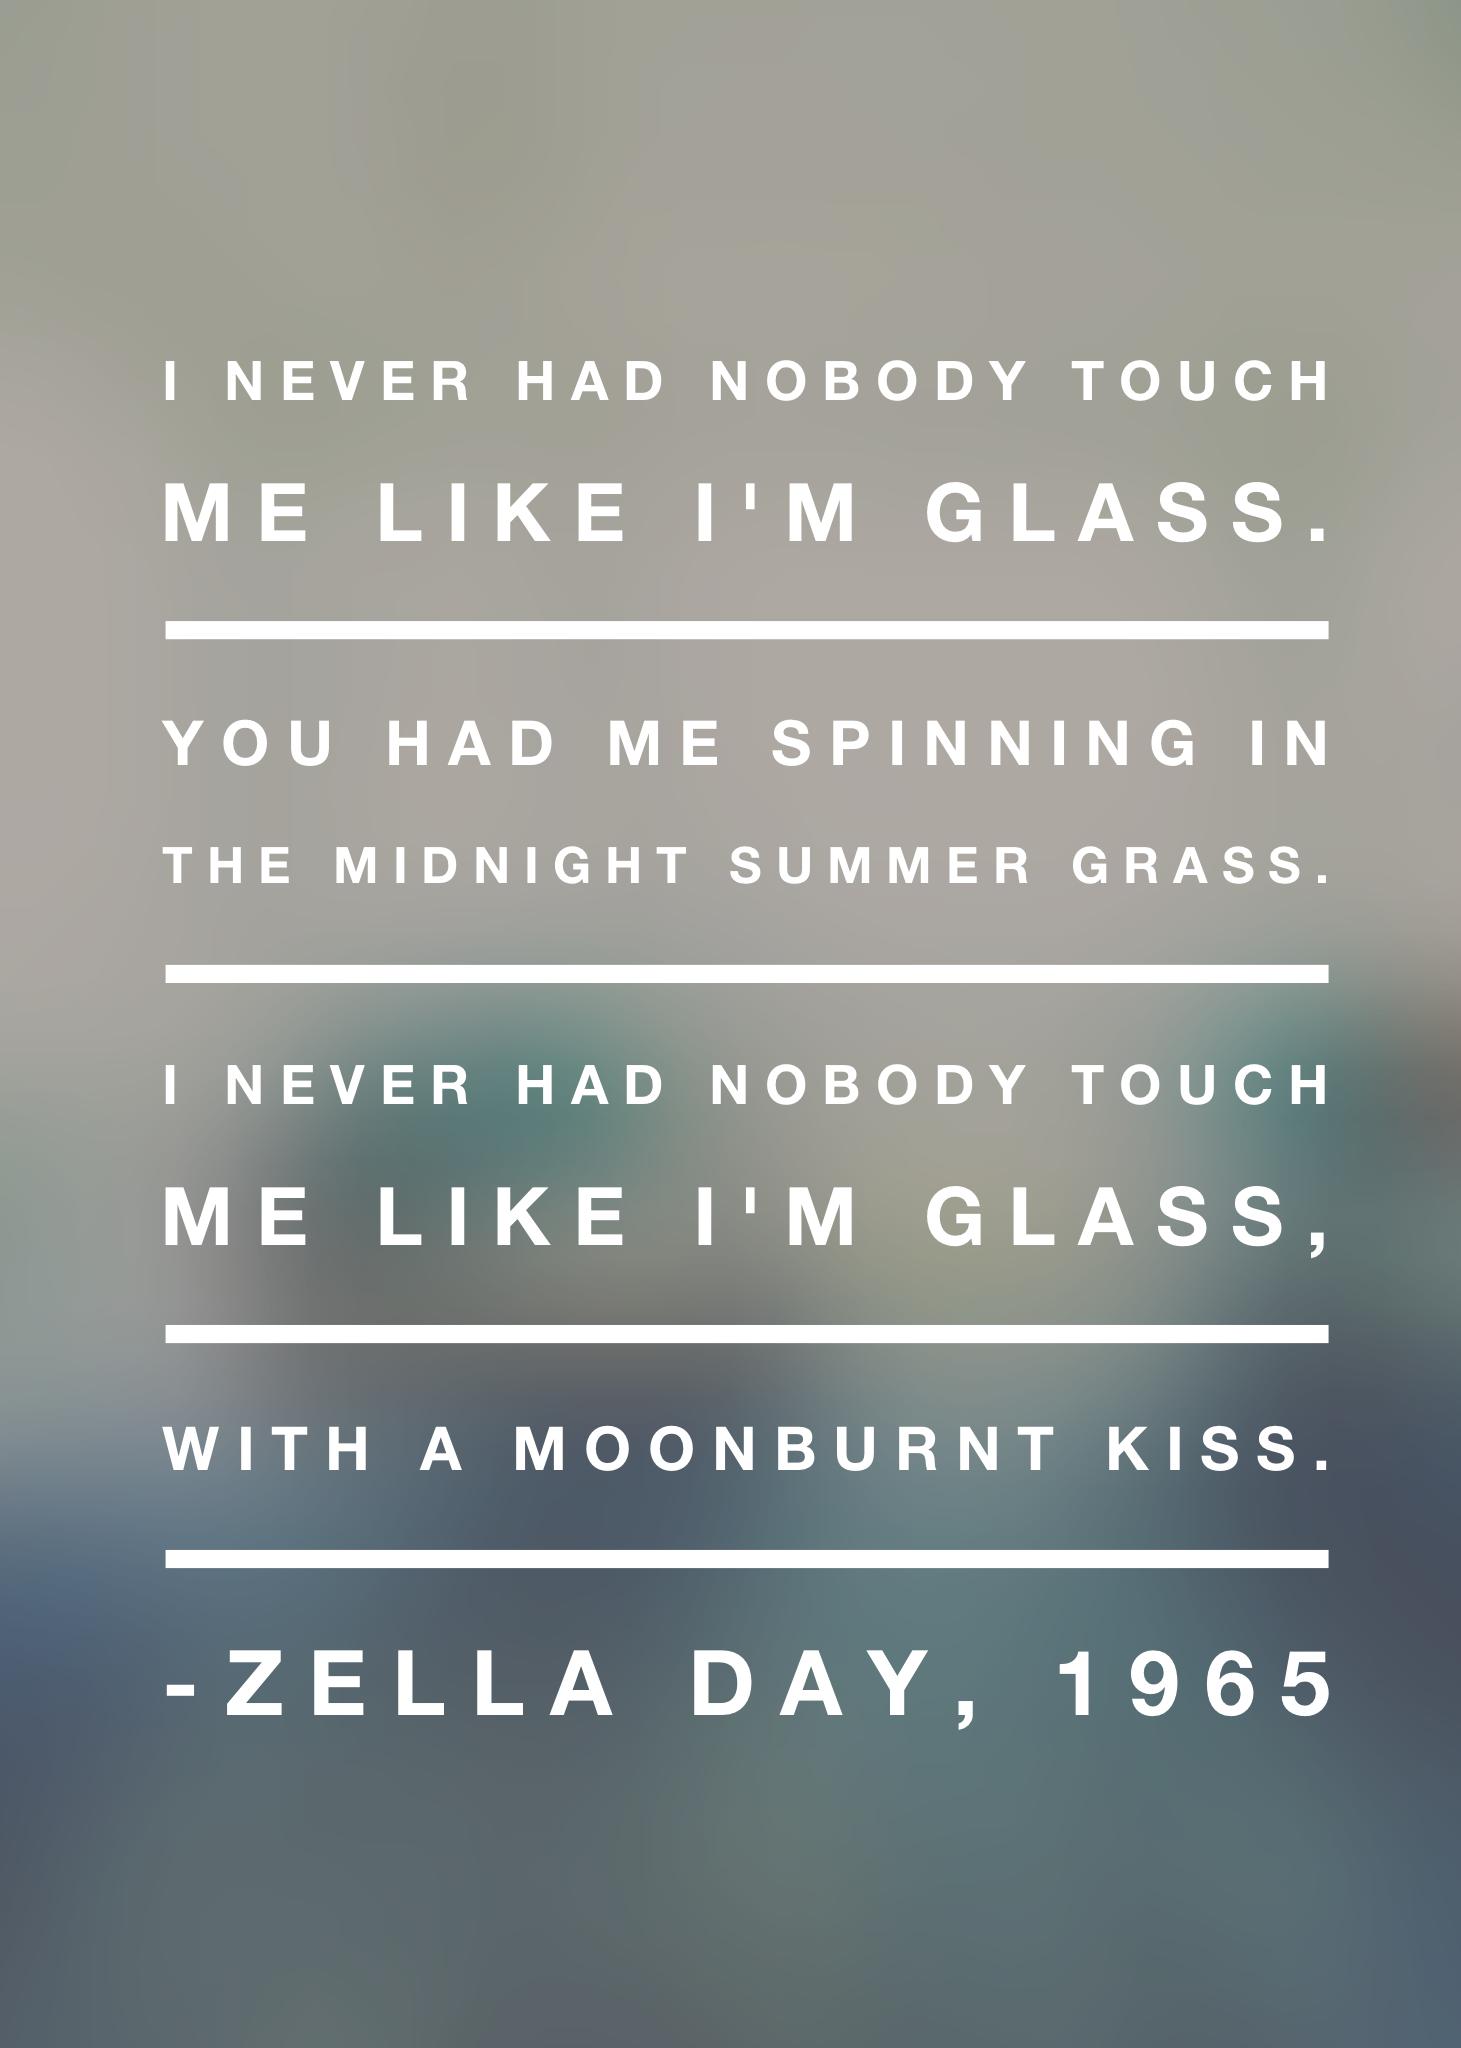 Zella Day 1965 Lyrics Zelladay 1965 Music Lyrics Lyrics